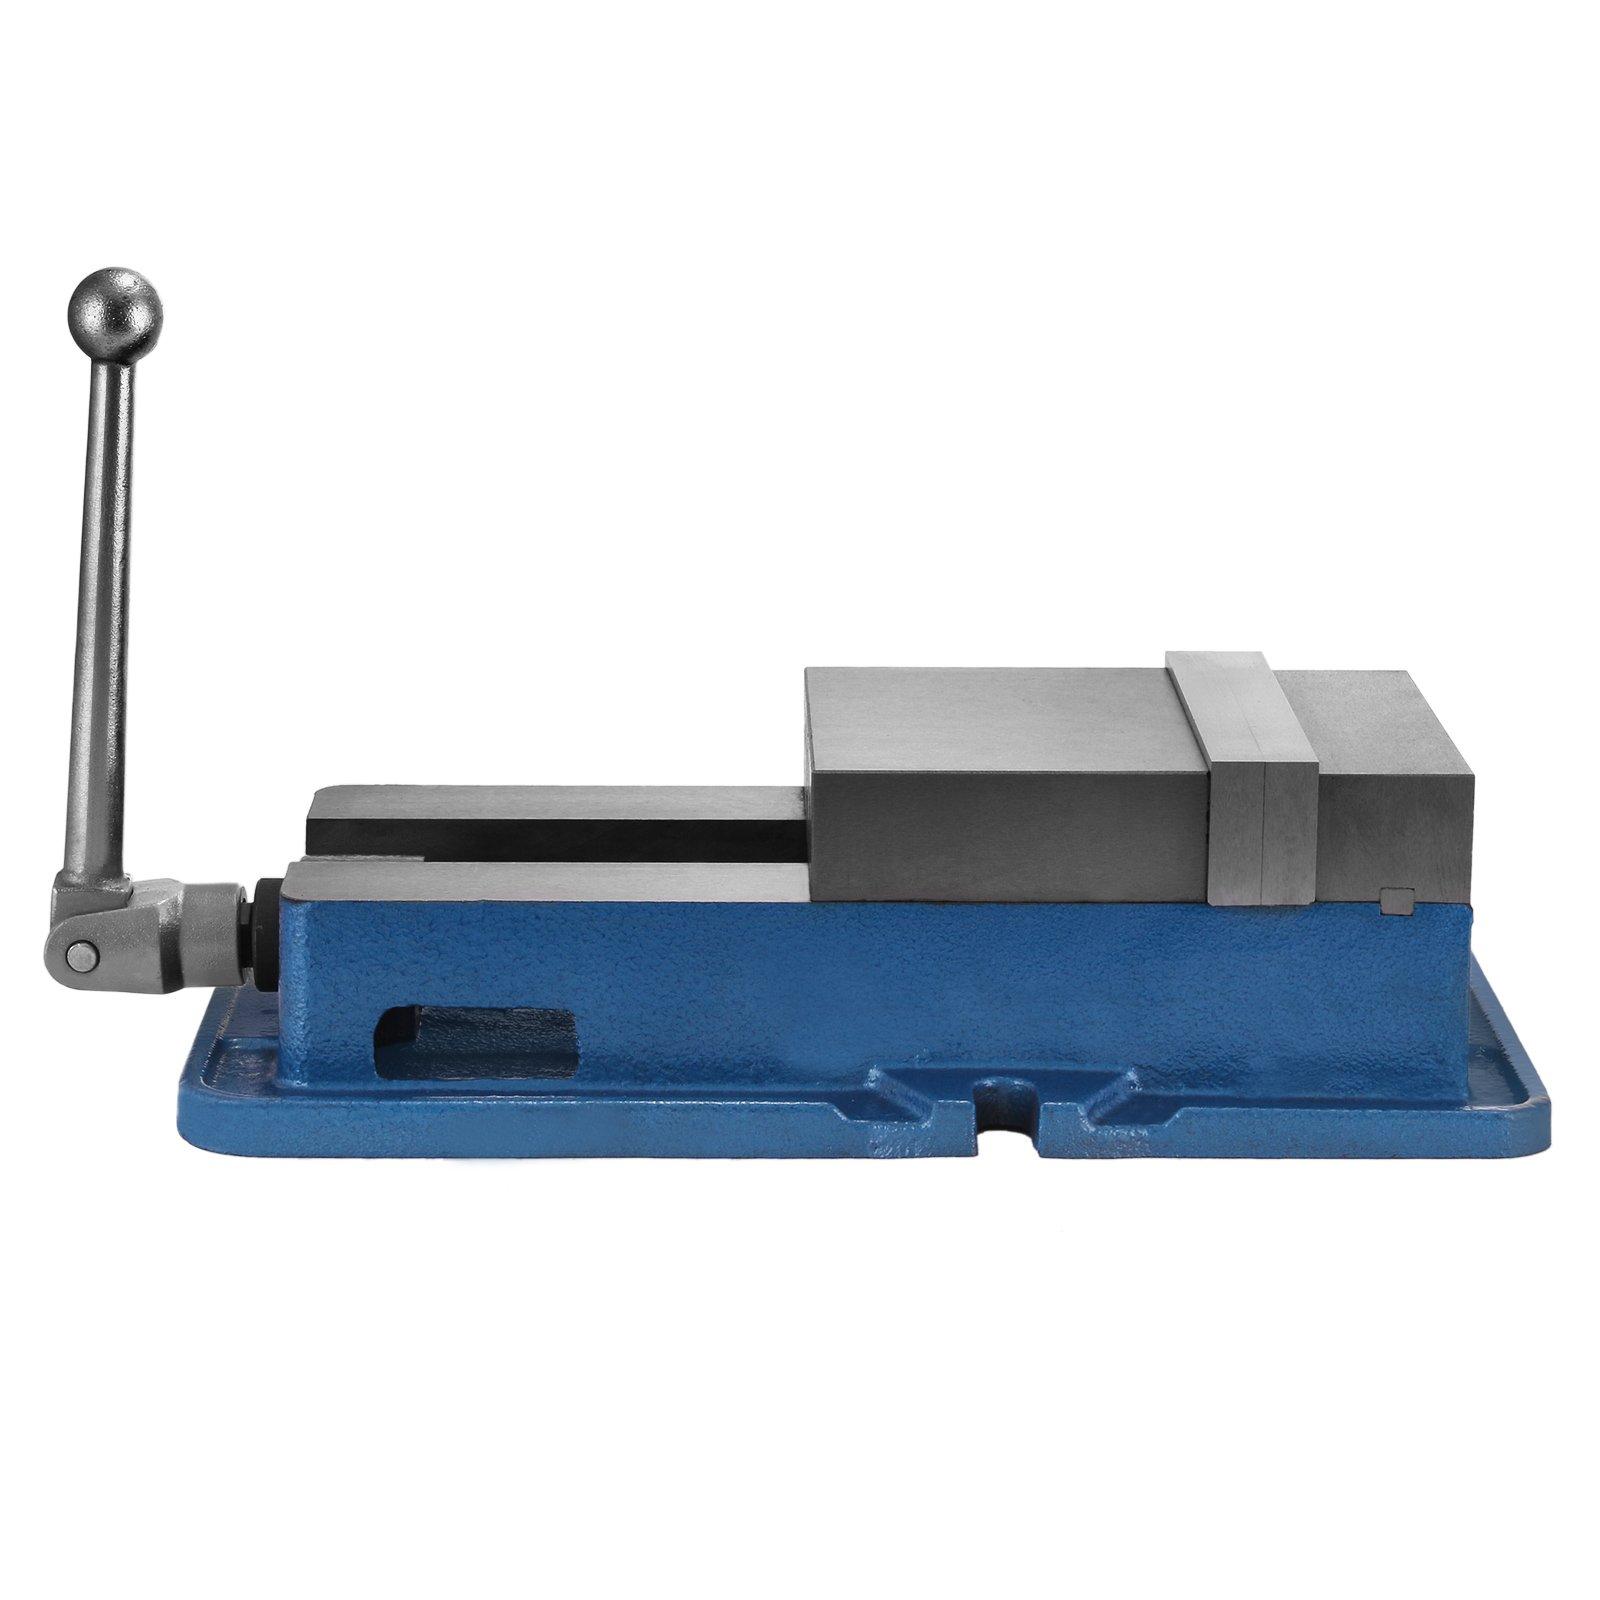 TOTOOL 6'' Precision Milling Machine Vises ACCU Lock Vise Jaw Opening 5.9inch Milling Drilling Machine Lock Down Vise Bench Clamp Multiple Vise Setups (6'' Precision Milling Vise)